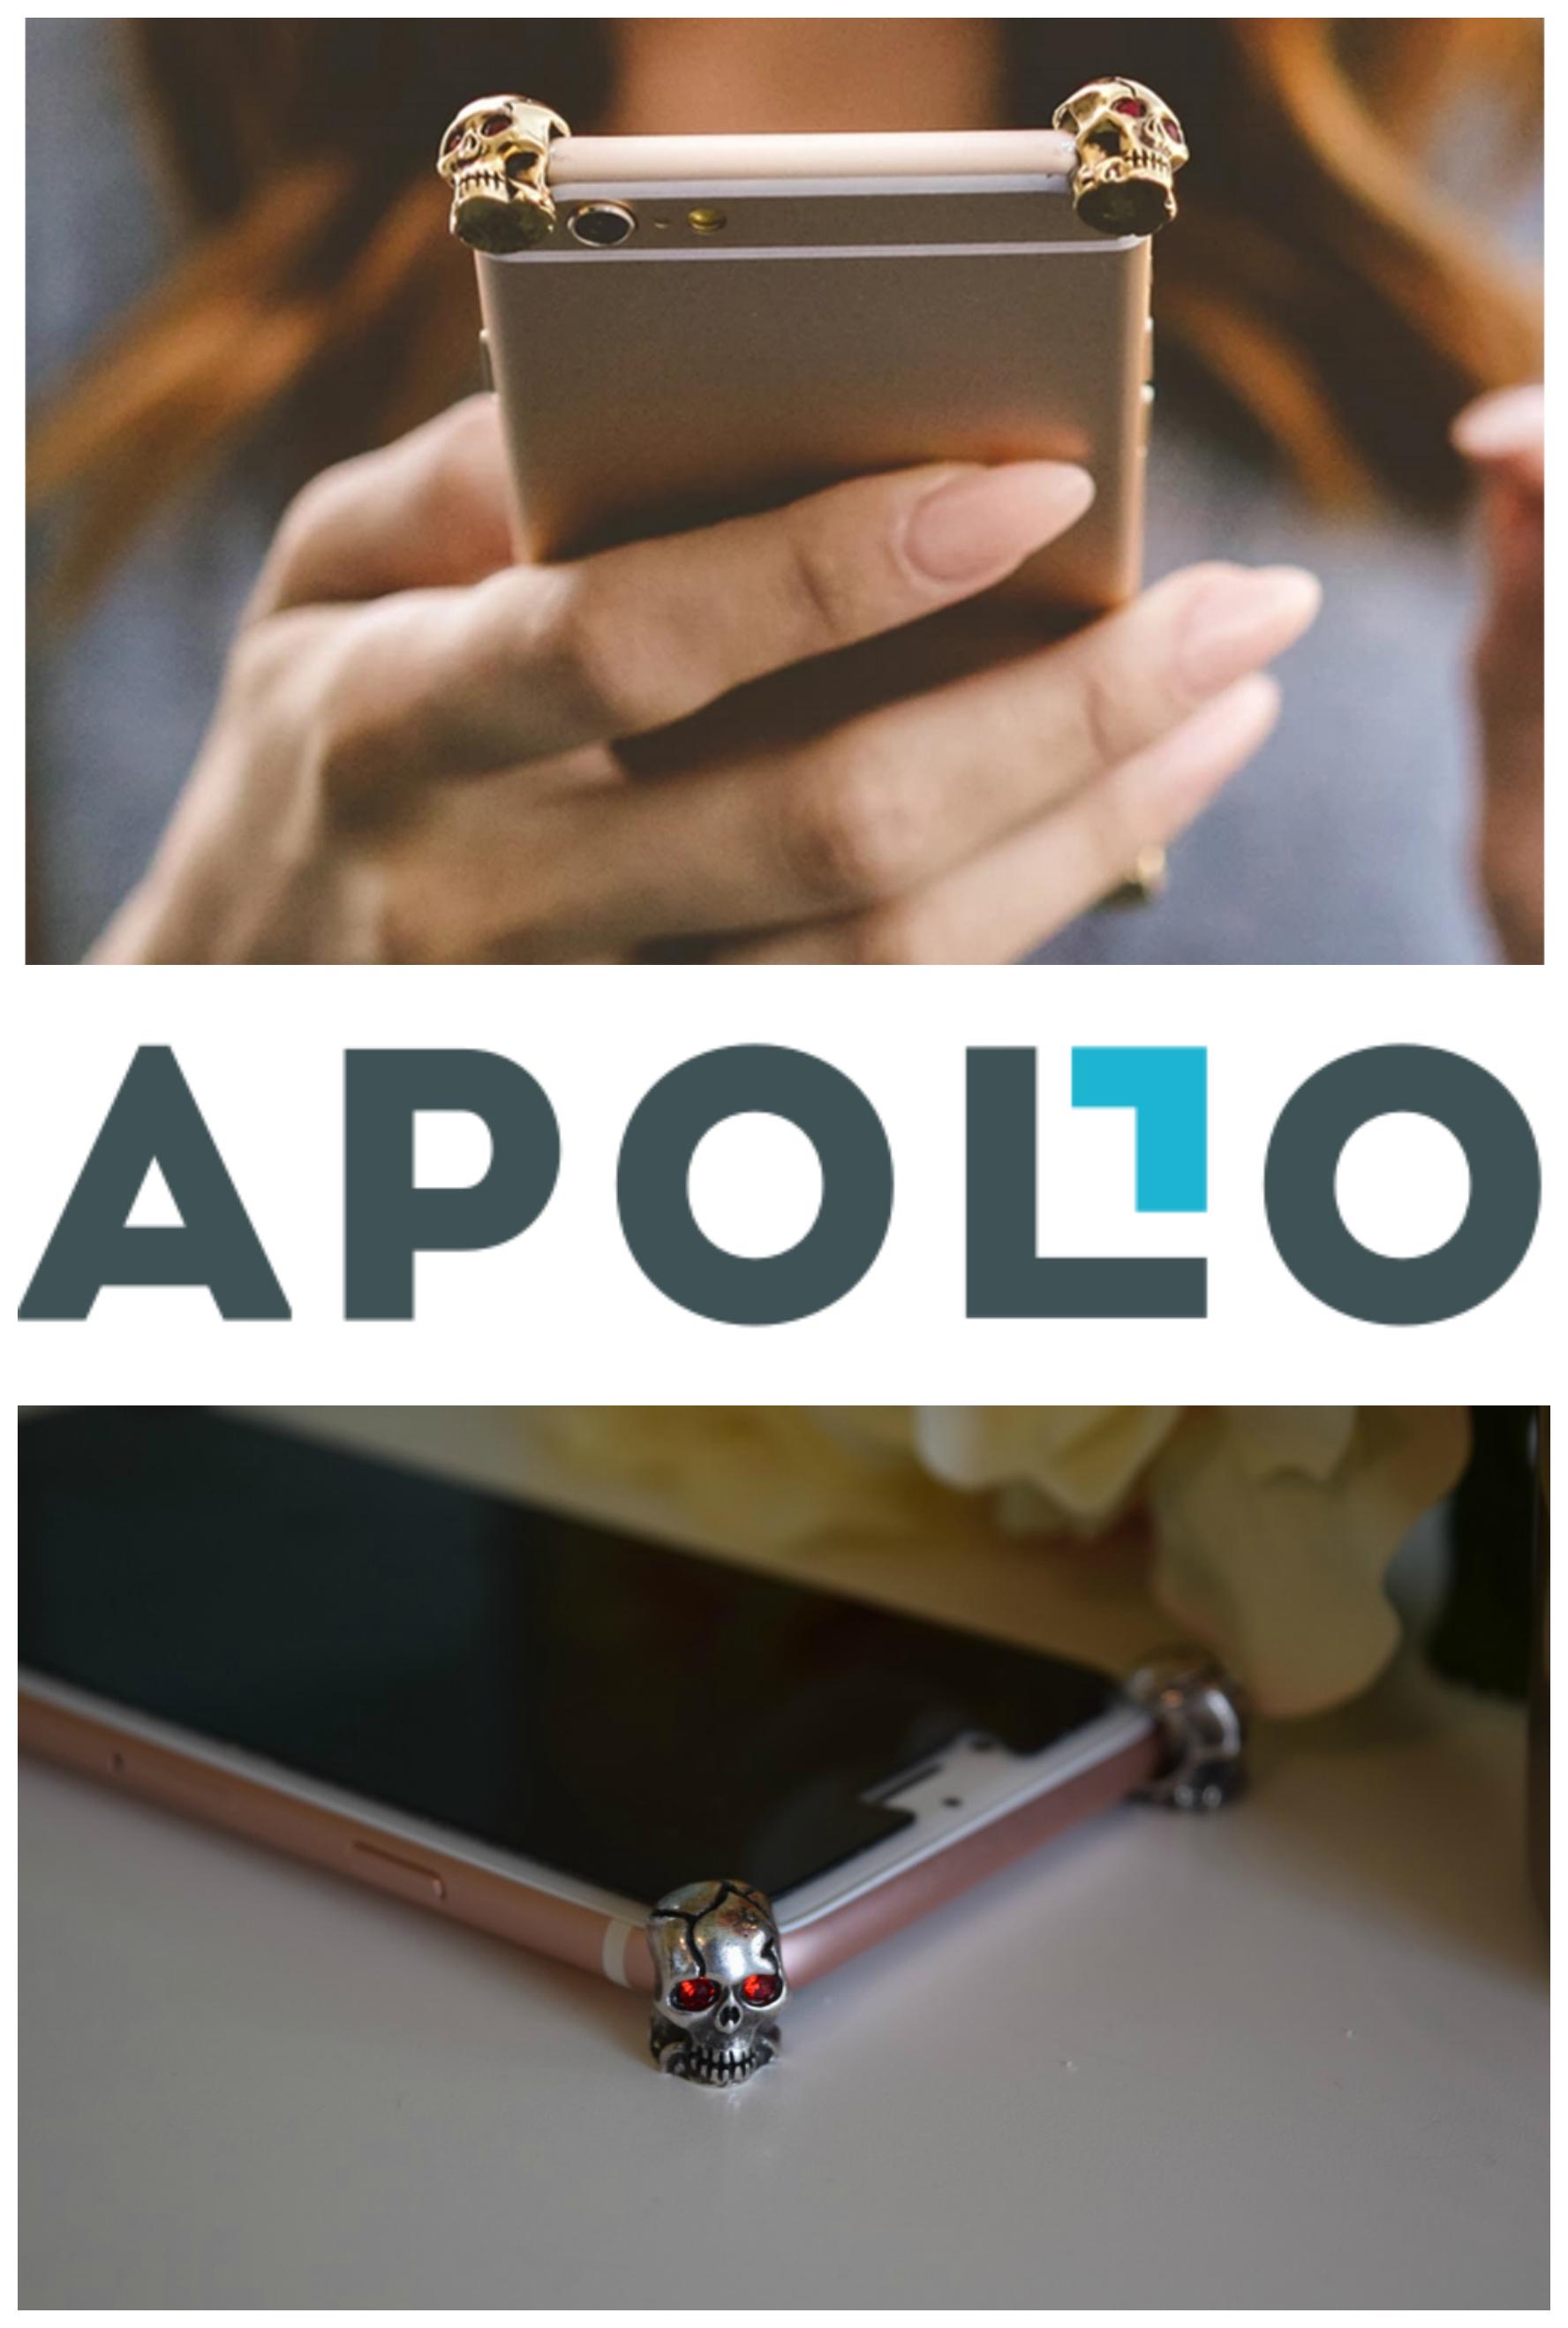 apollo box phone anti cases